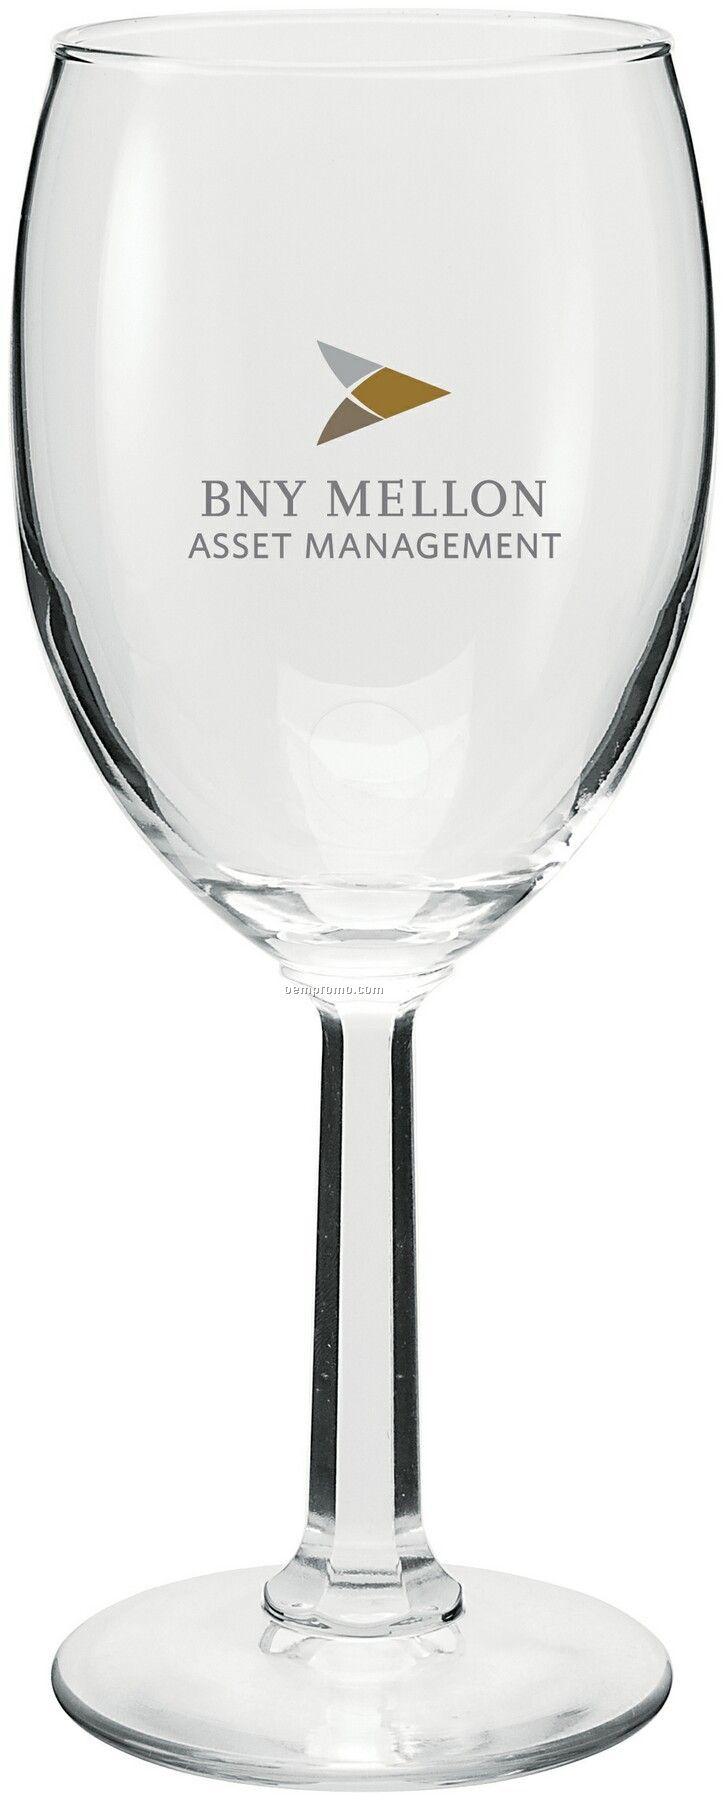 10 Oz. Napa Collection Goblet Glass